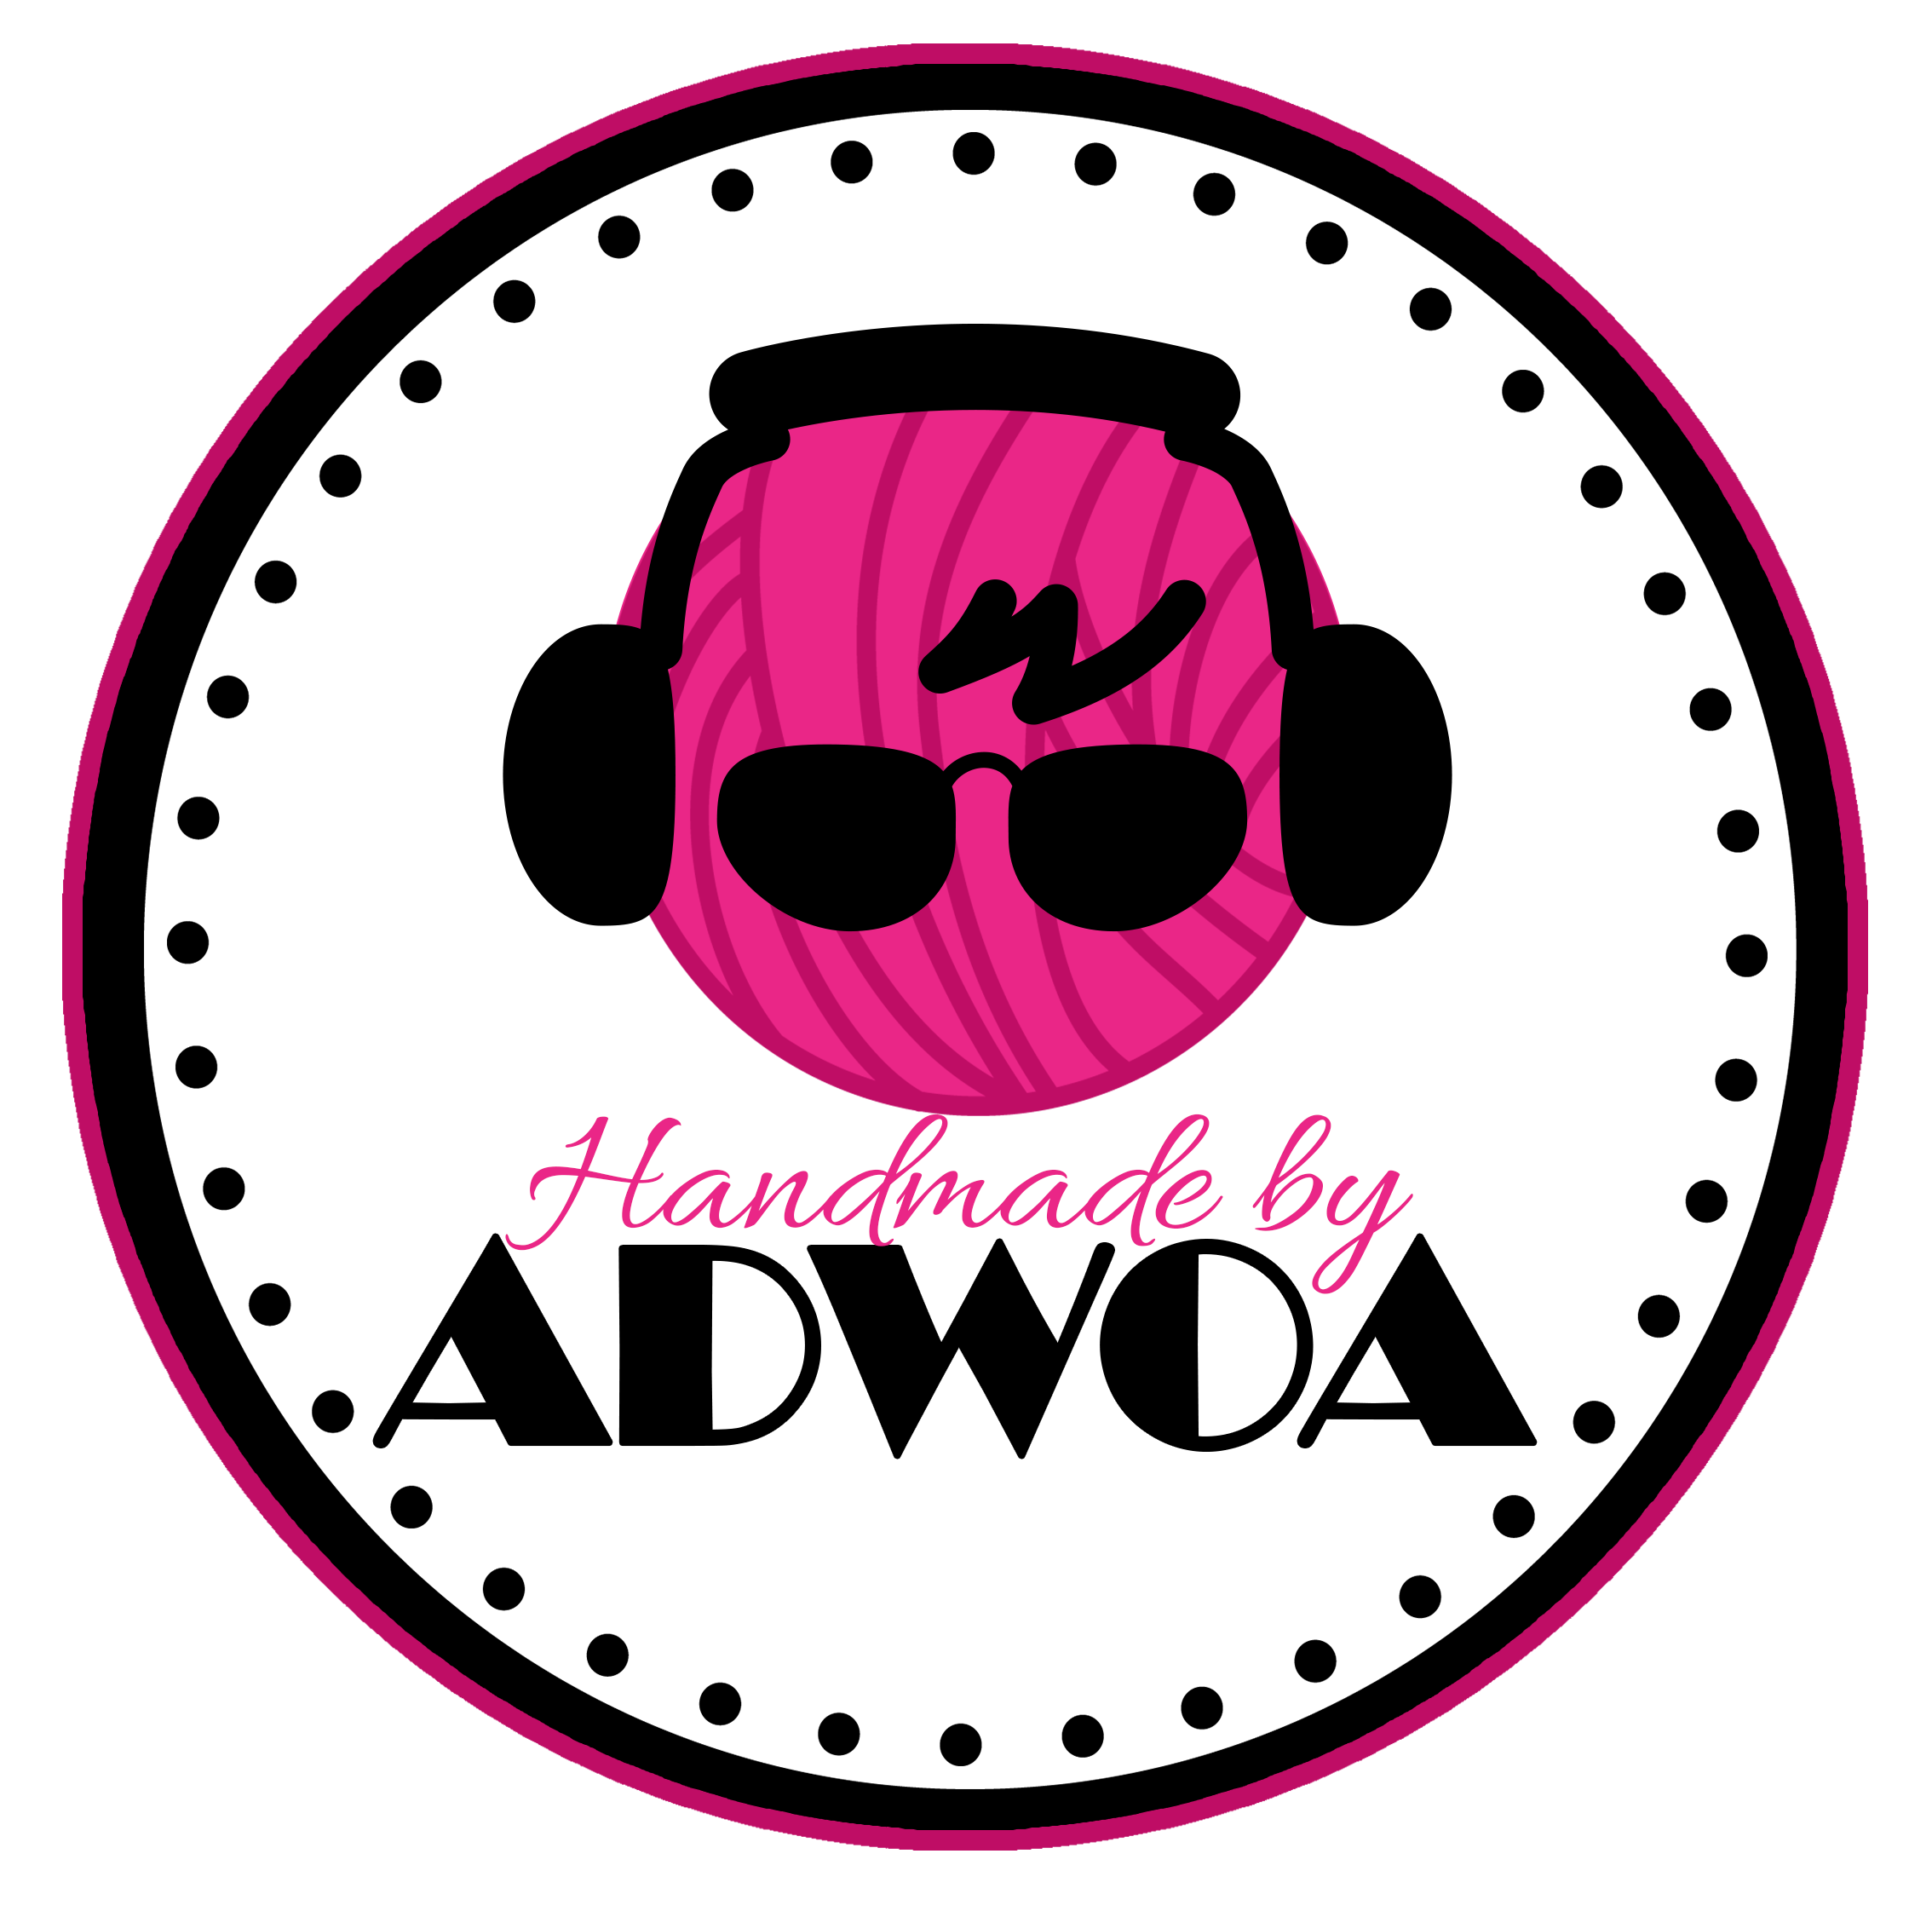 handmade-by-adwoa.png